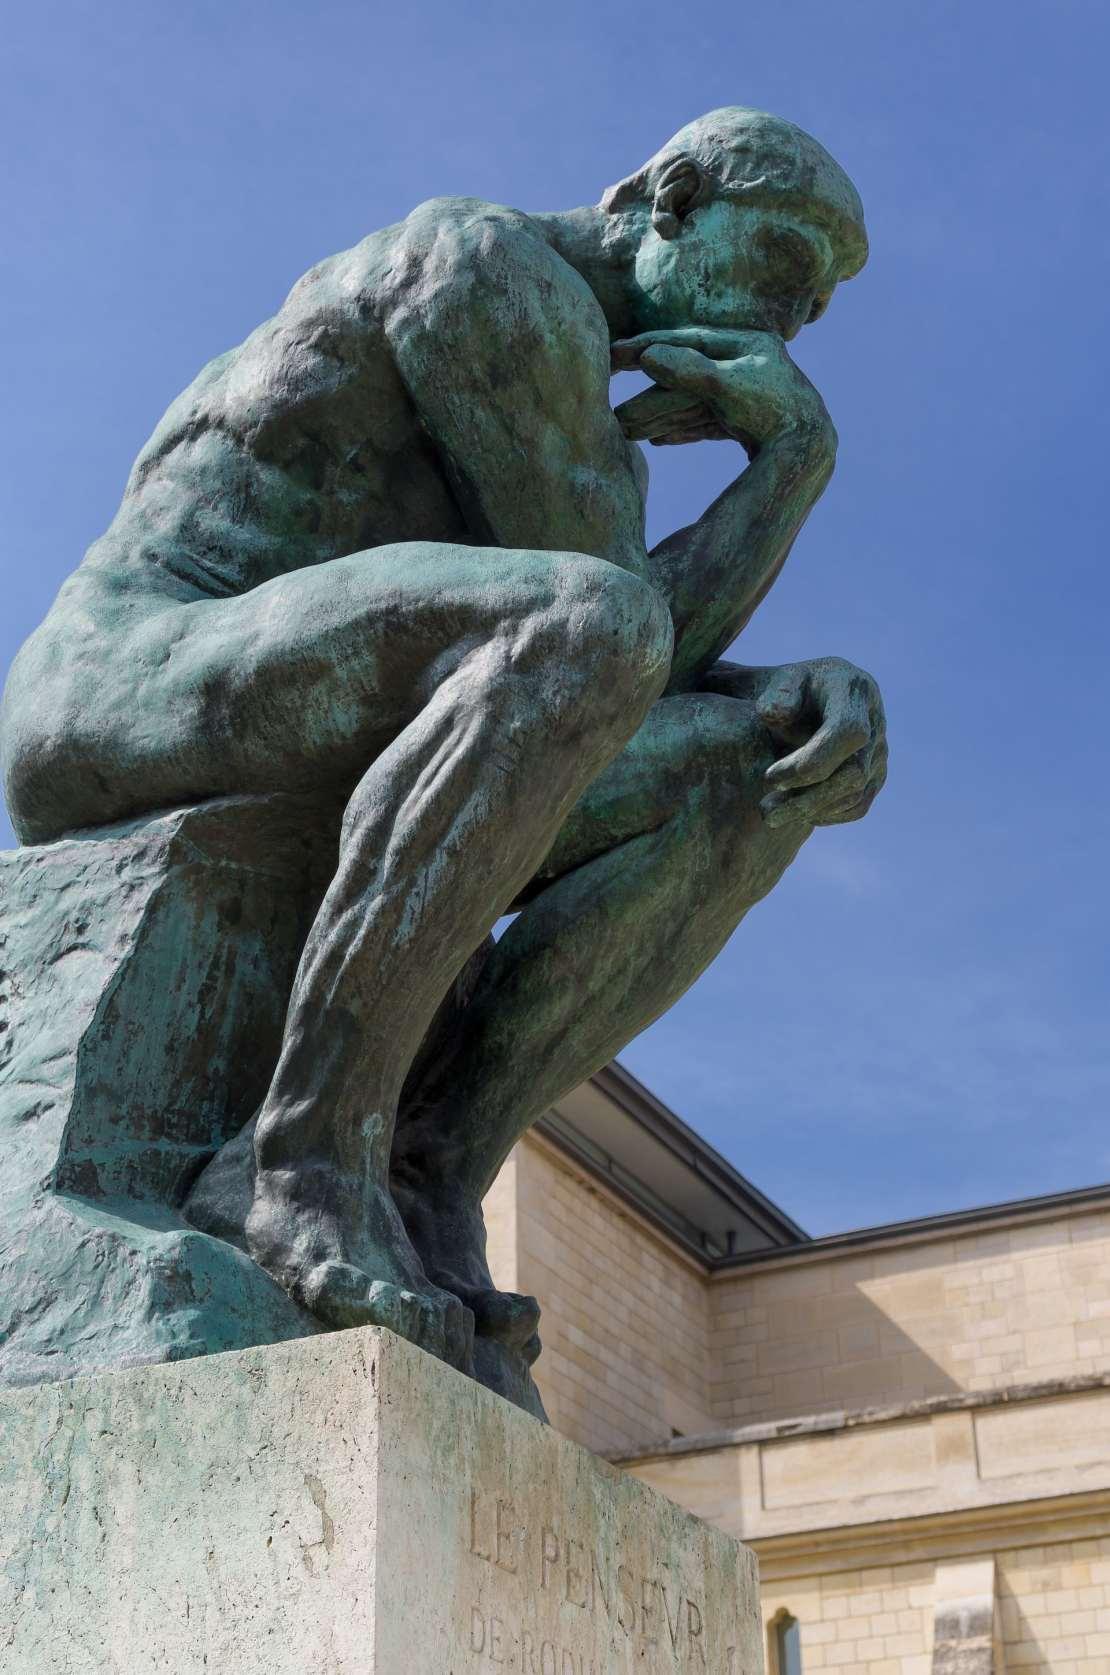 Image of Rodin's The Thinker.